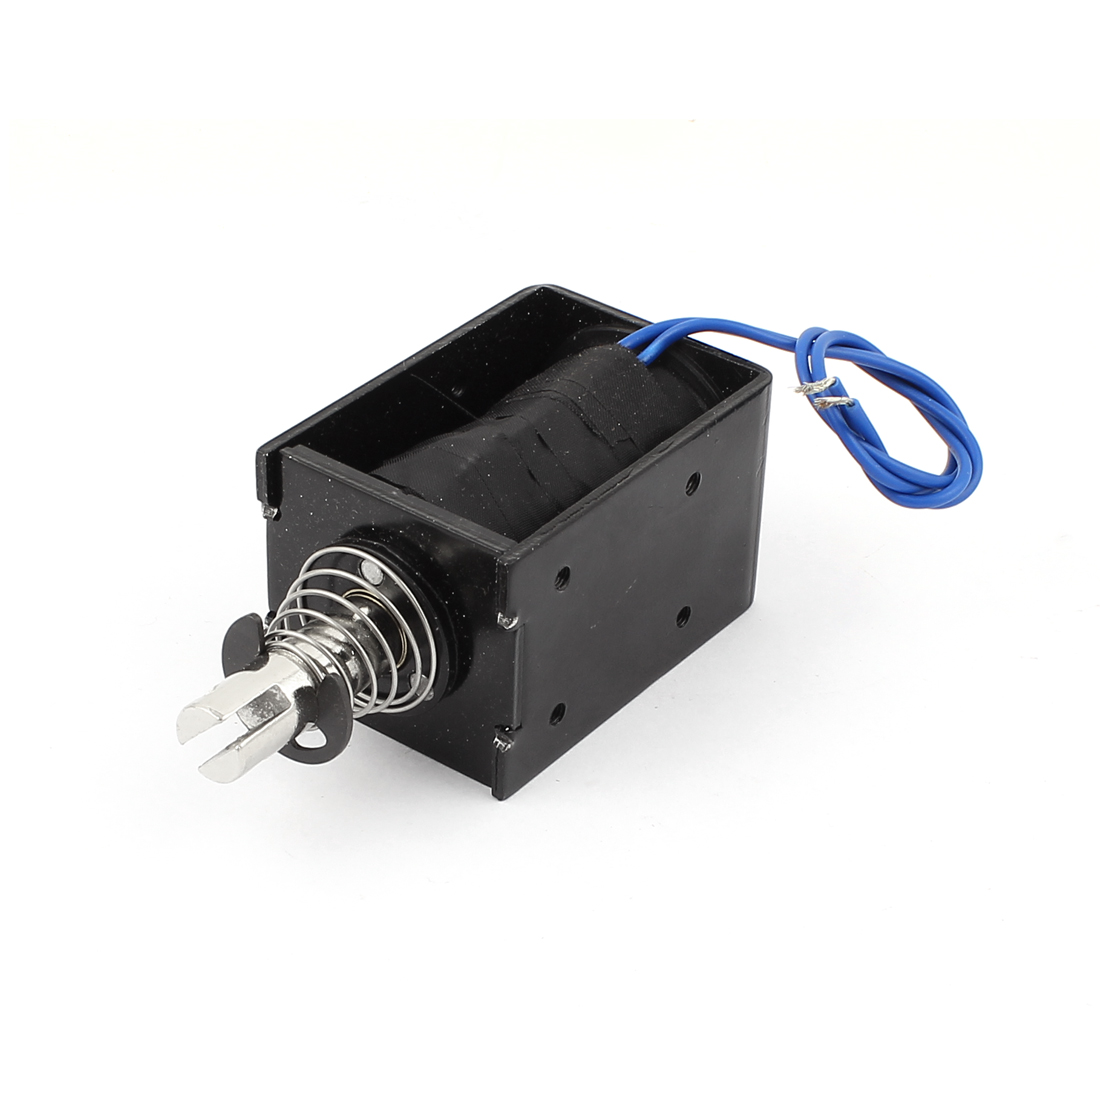 10mm Stroke 80N 8Kg Holding Force Push Pull Type Solenoid Electromagnet DC 24V 0.55A